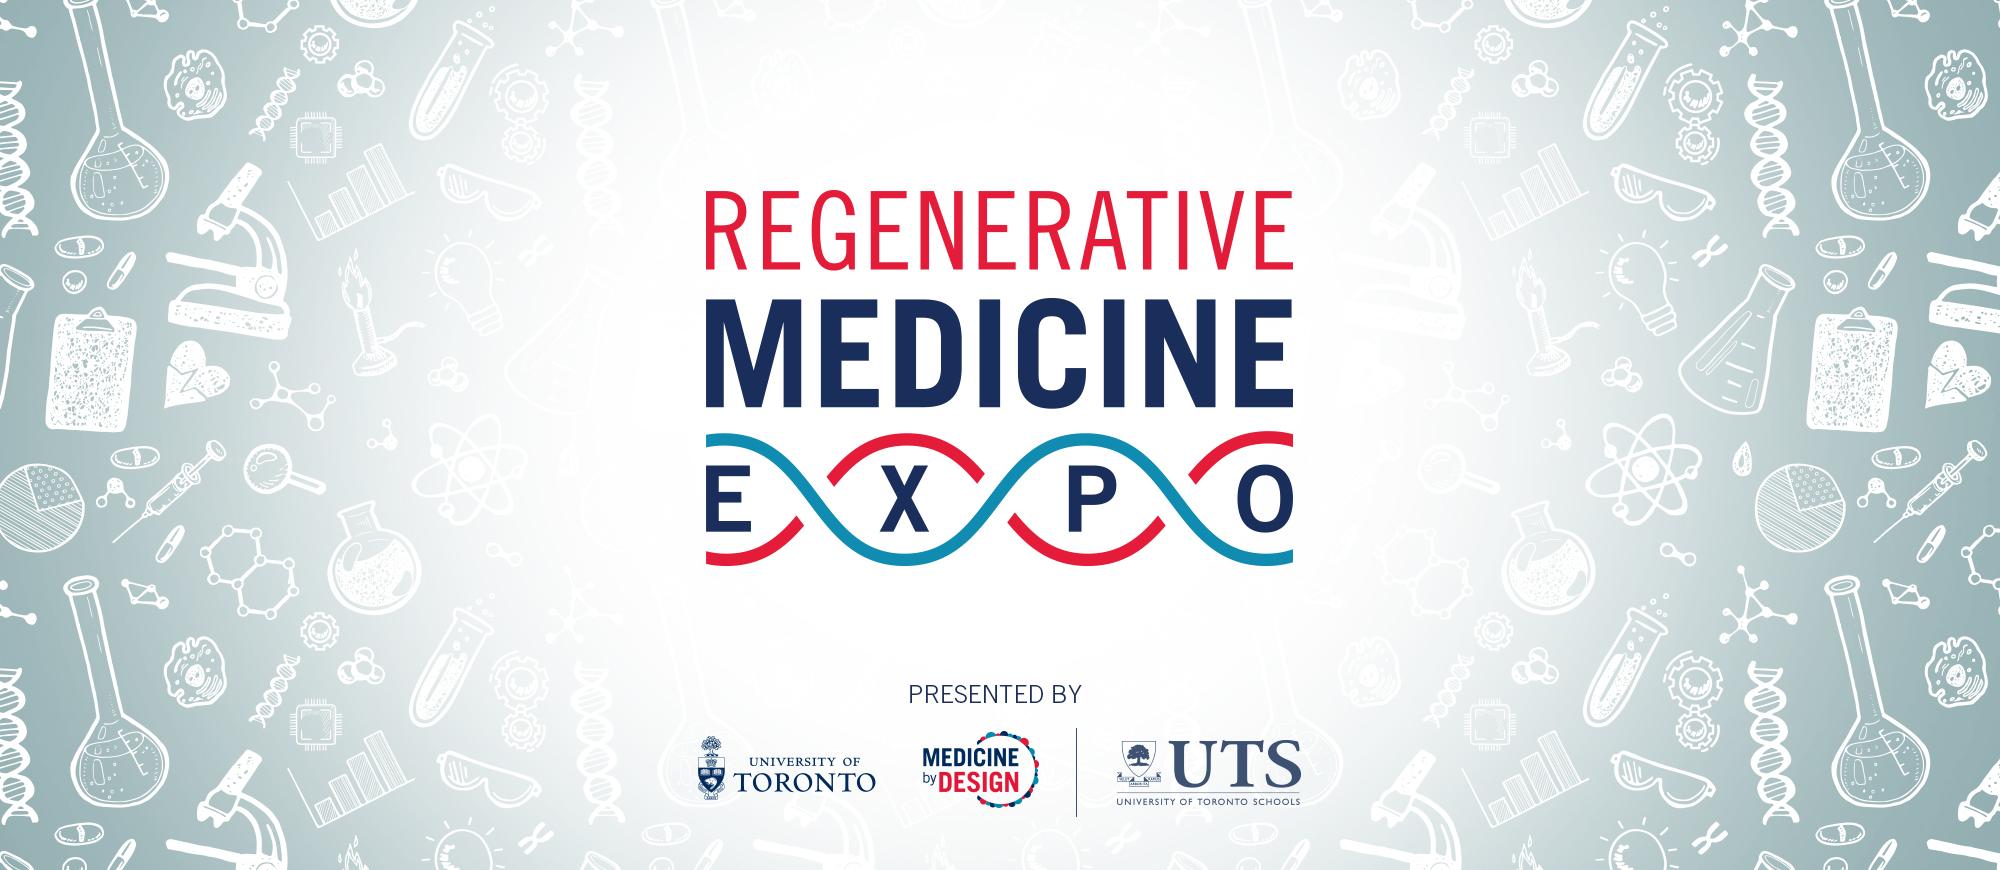 Regenerative Medicine Expo 2018